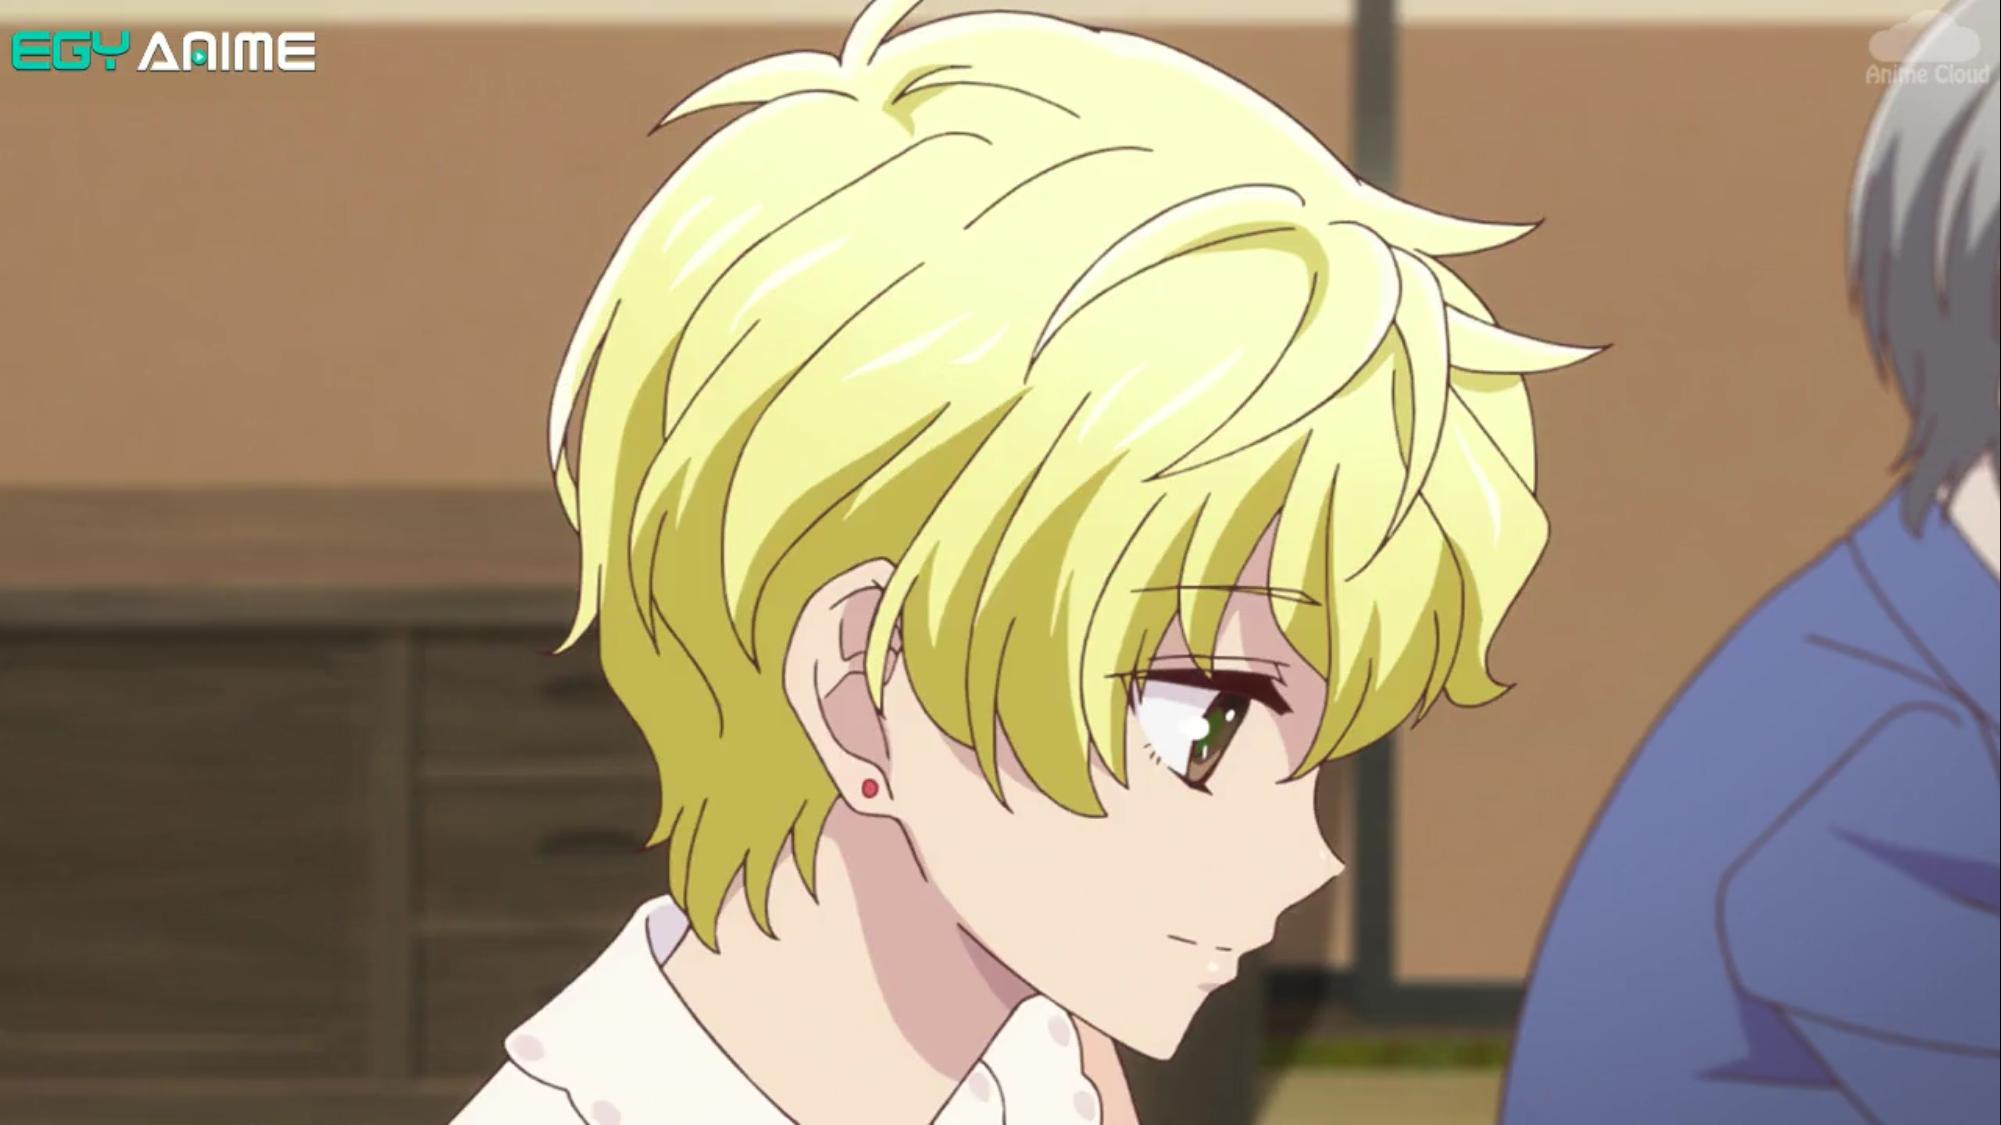 Anime spring 2019 image by nuna Fruits basket anime